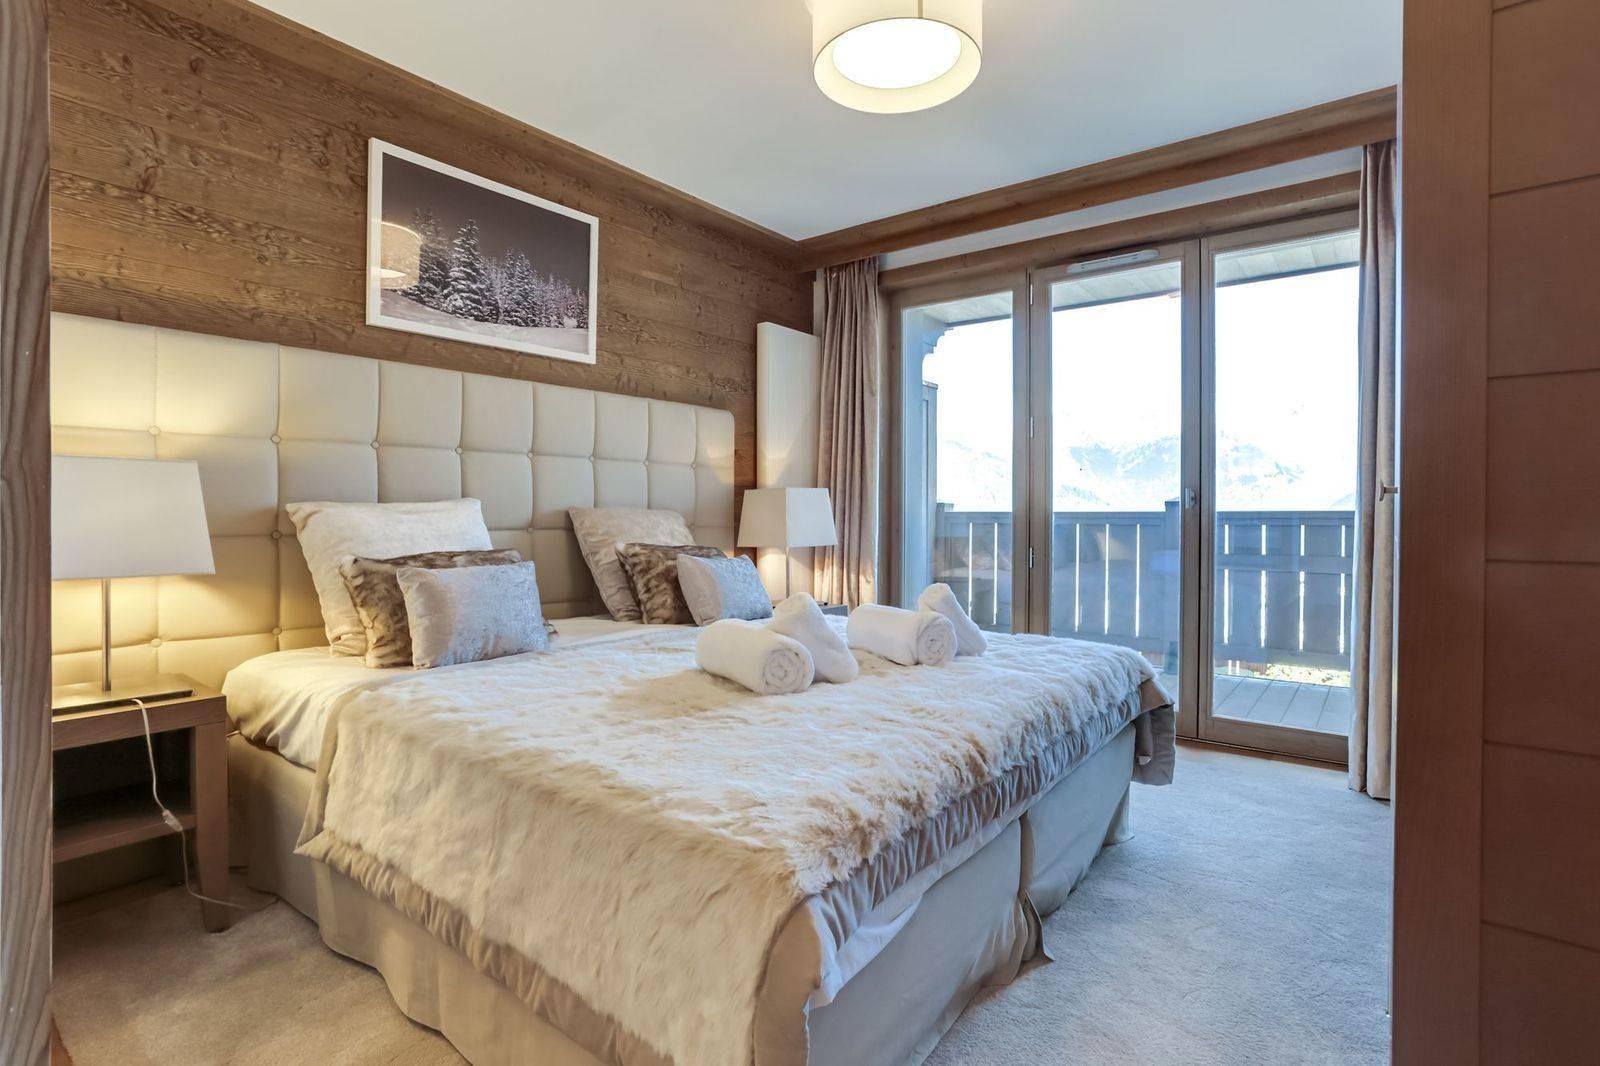 Courchevel 1550 Luxury Rental Appartment Telikia Bedroom 2